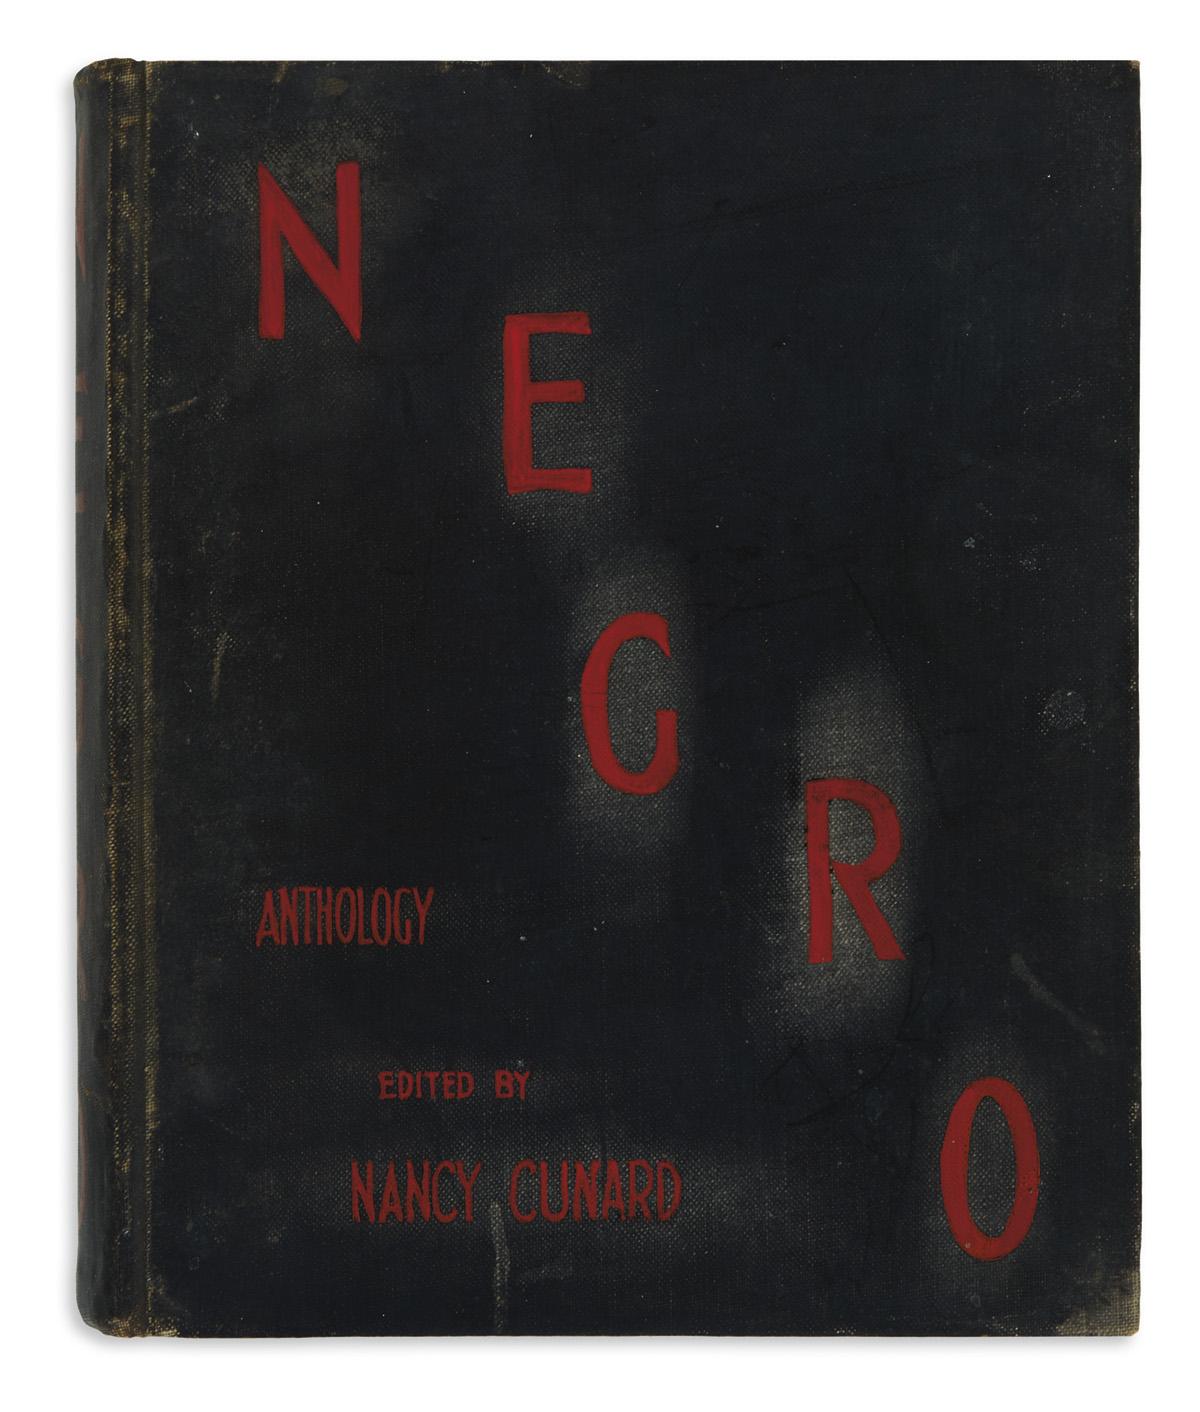 (LITERATURE.) Cunard, Nancy; editor. Negro Anthology, Made by Nancy Cunard, 1931-1933.